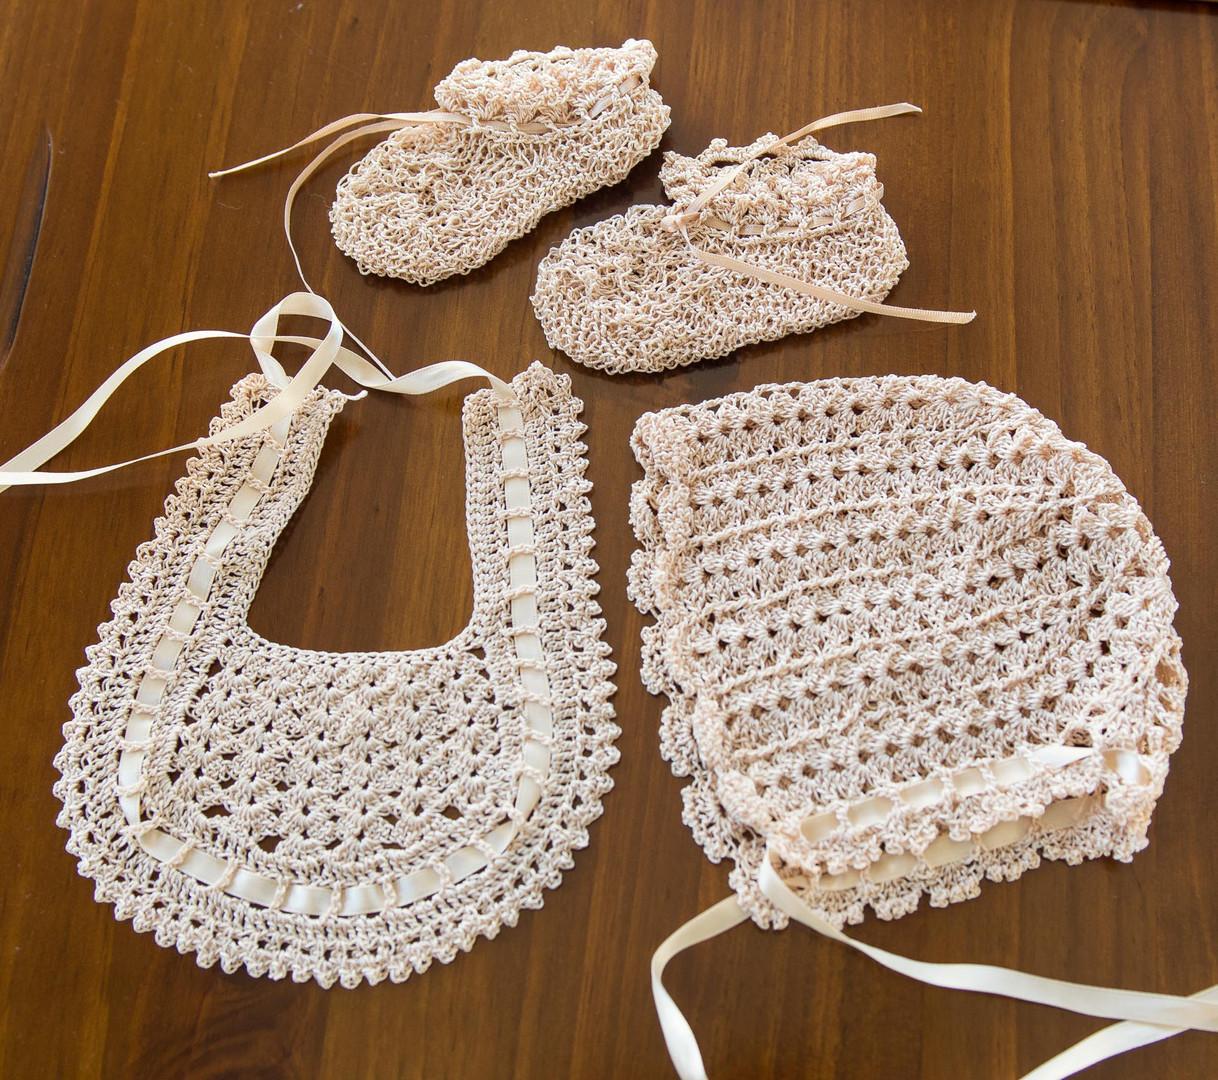 Crochet rayon set.jpg